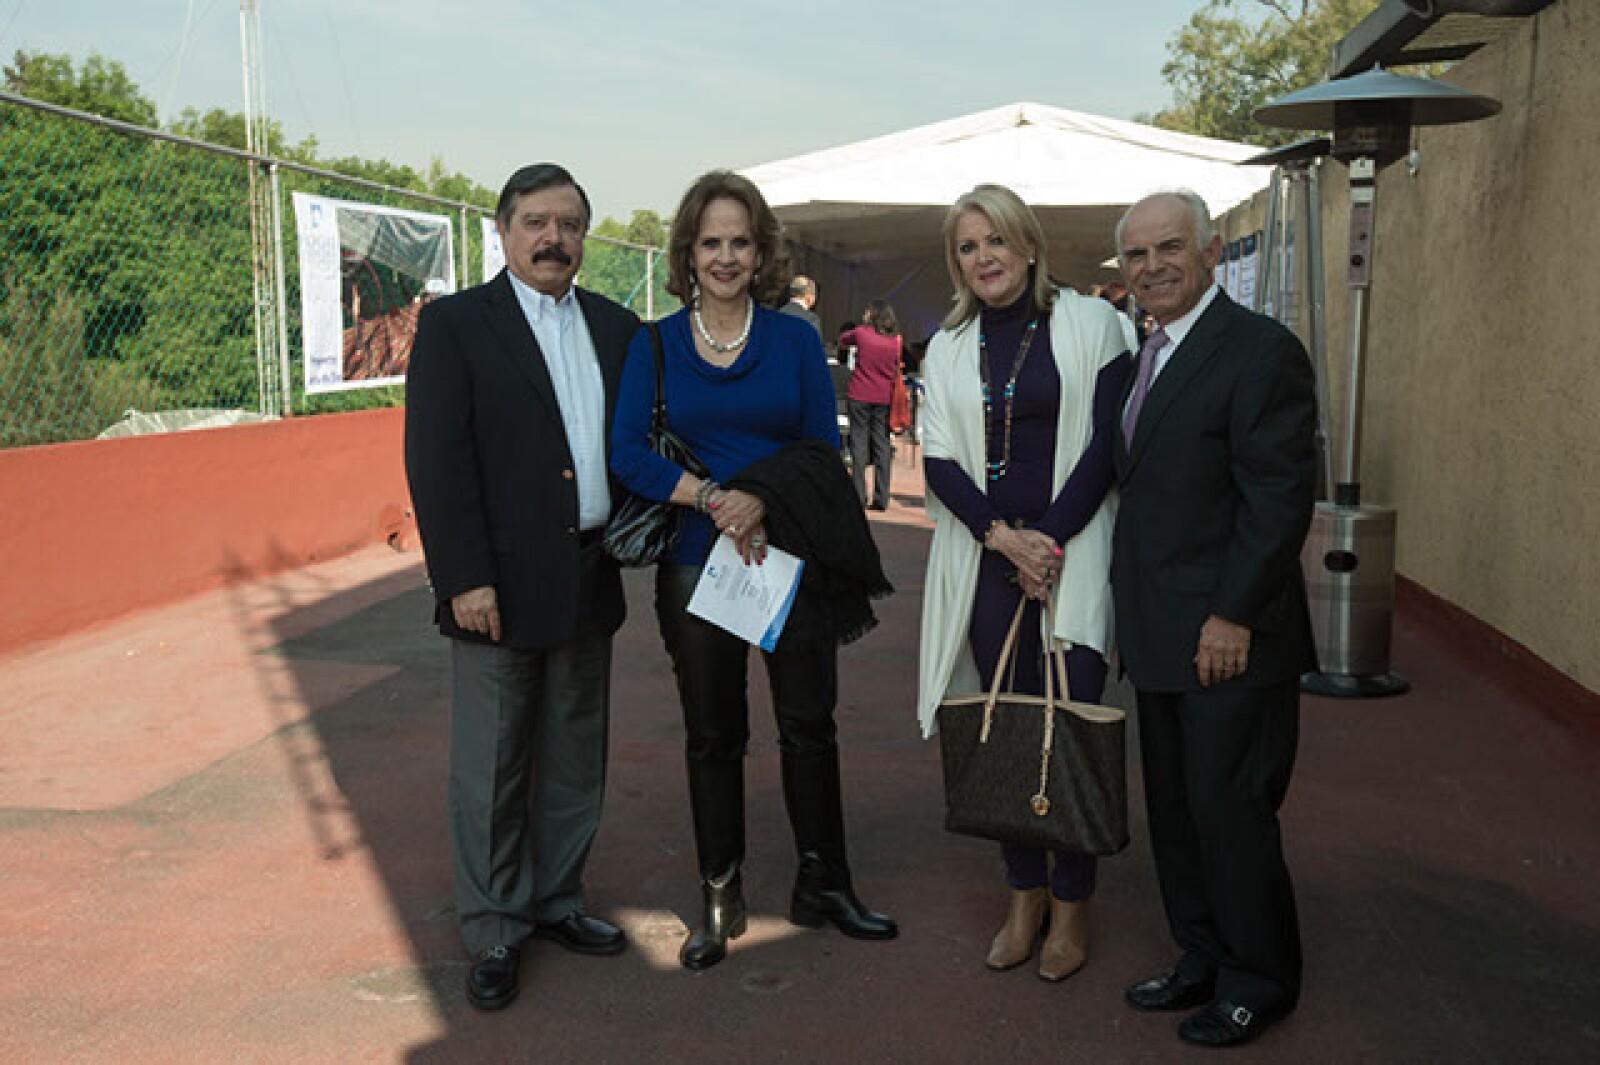 Luis Manrique,Olivia Manrique,Susana Henkel,Ernesto Ibarra